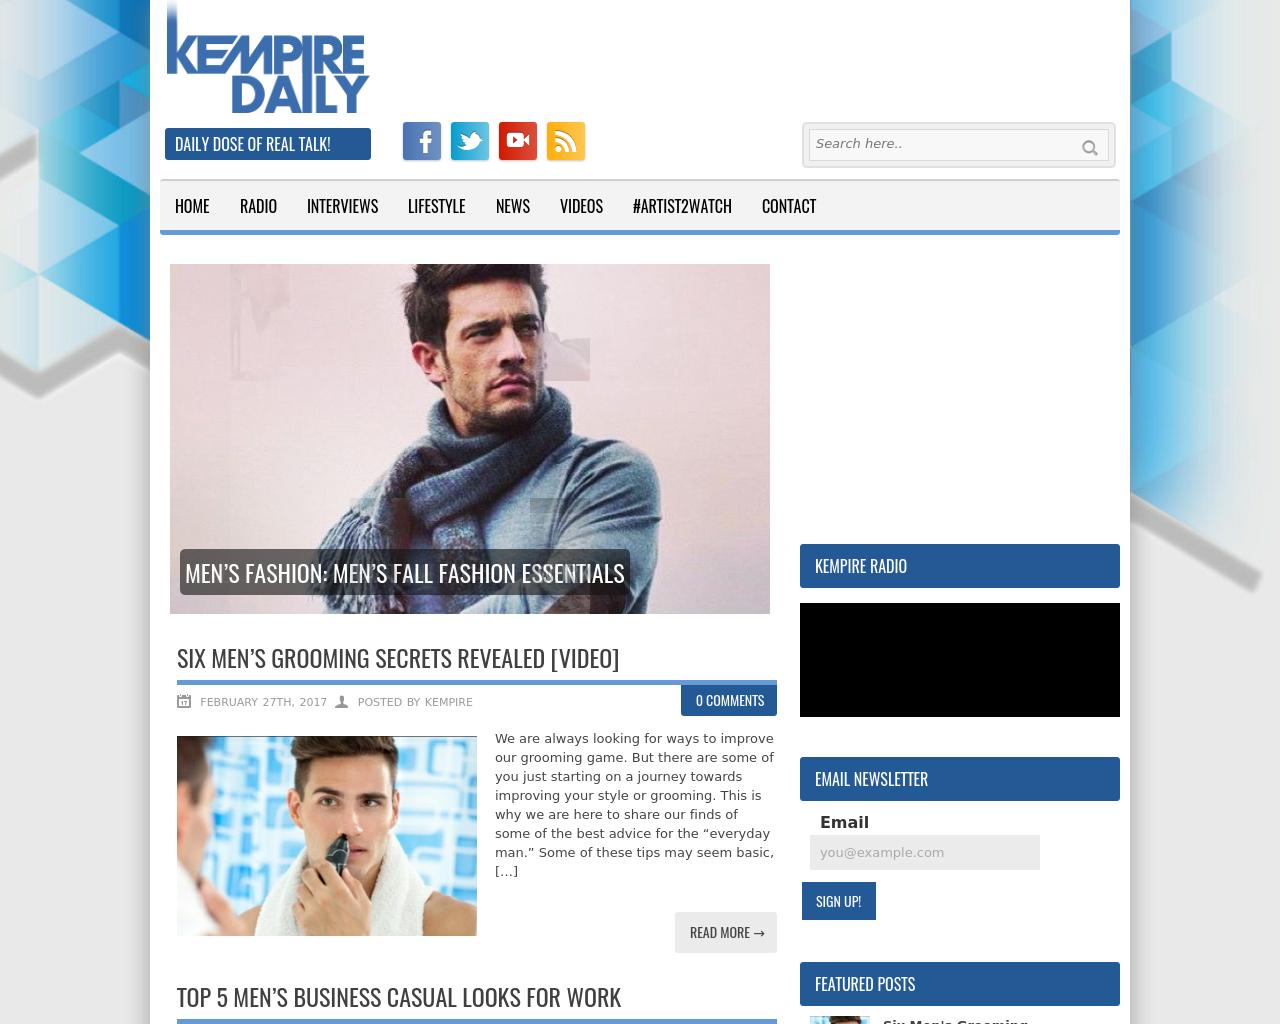 Kempire-Daily-Advertising-Reviews-Pricing